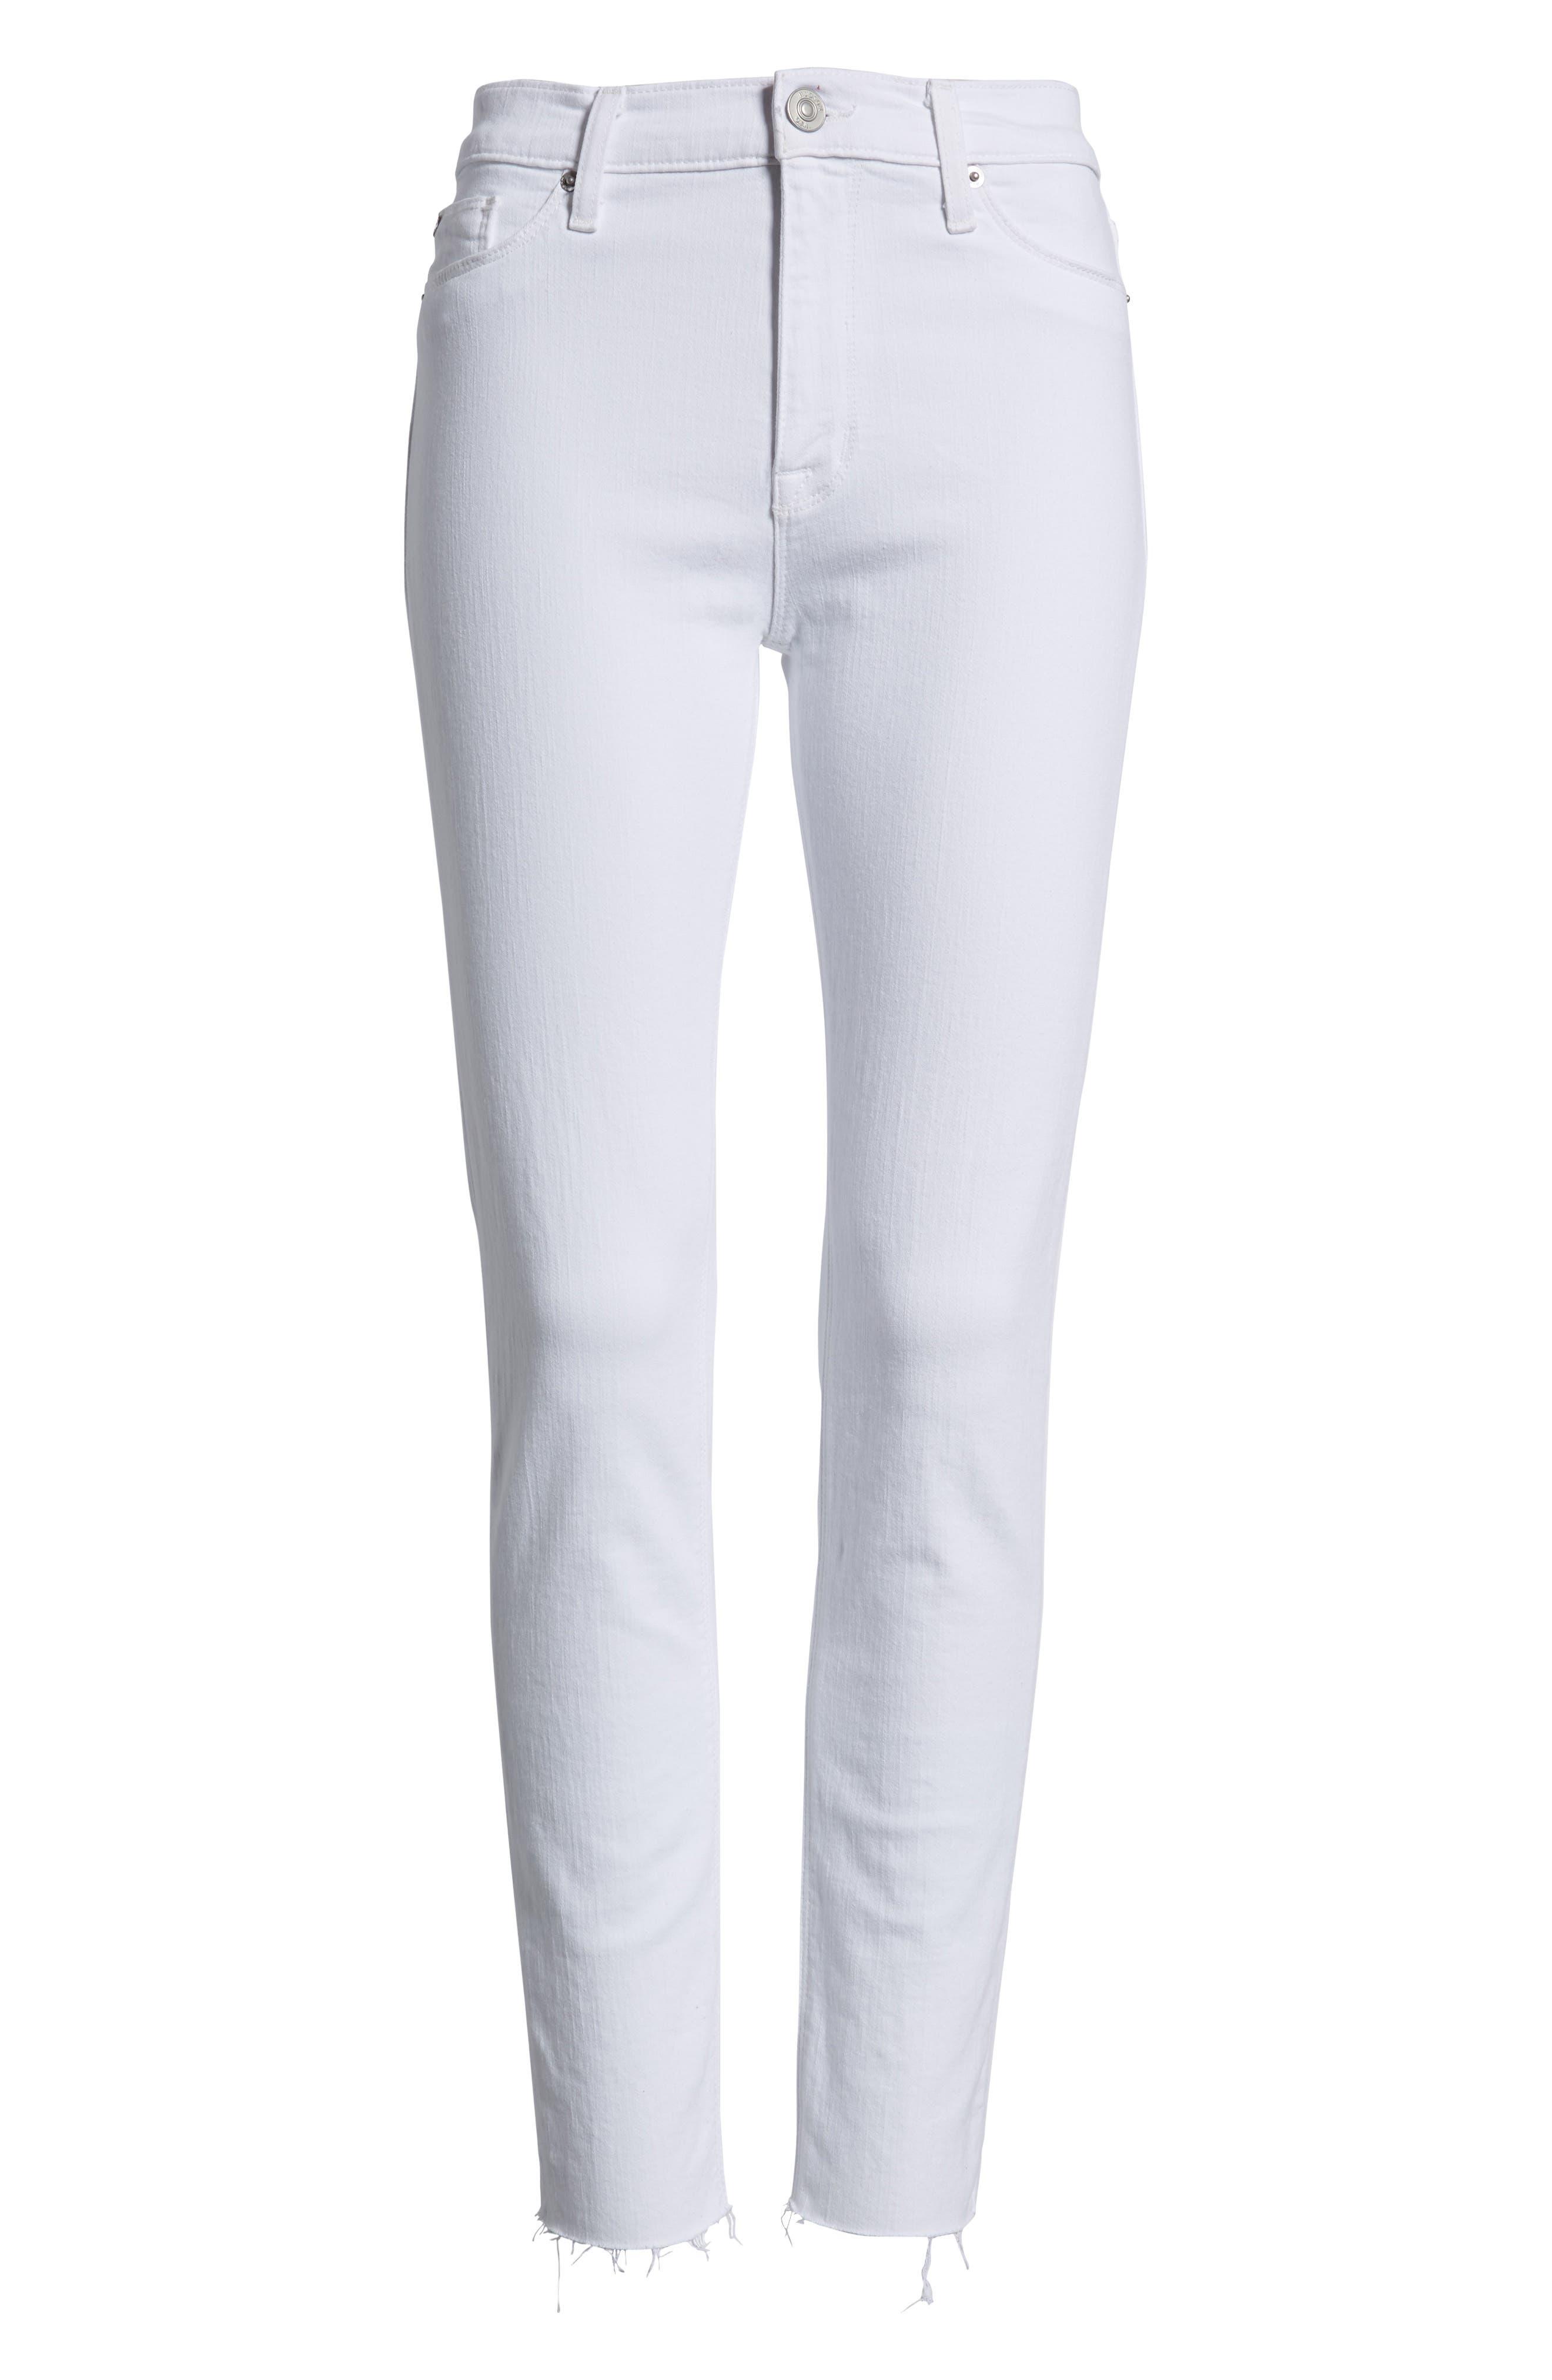 Barbara High Waist Raw Hem Ankle Skinny Jeans,                             Alternate thumbnail 7, color,                             110